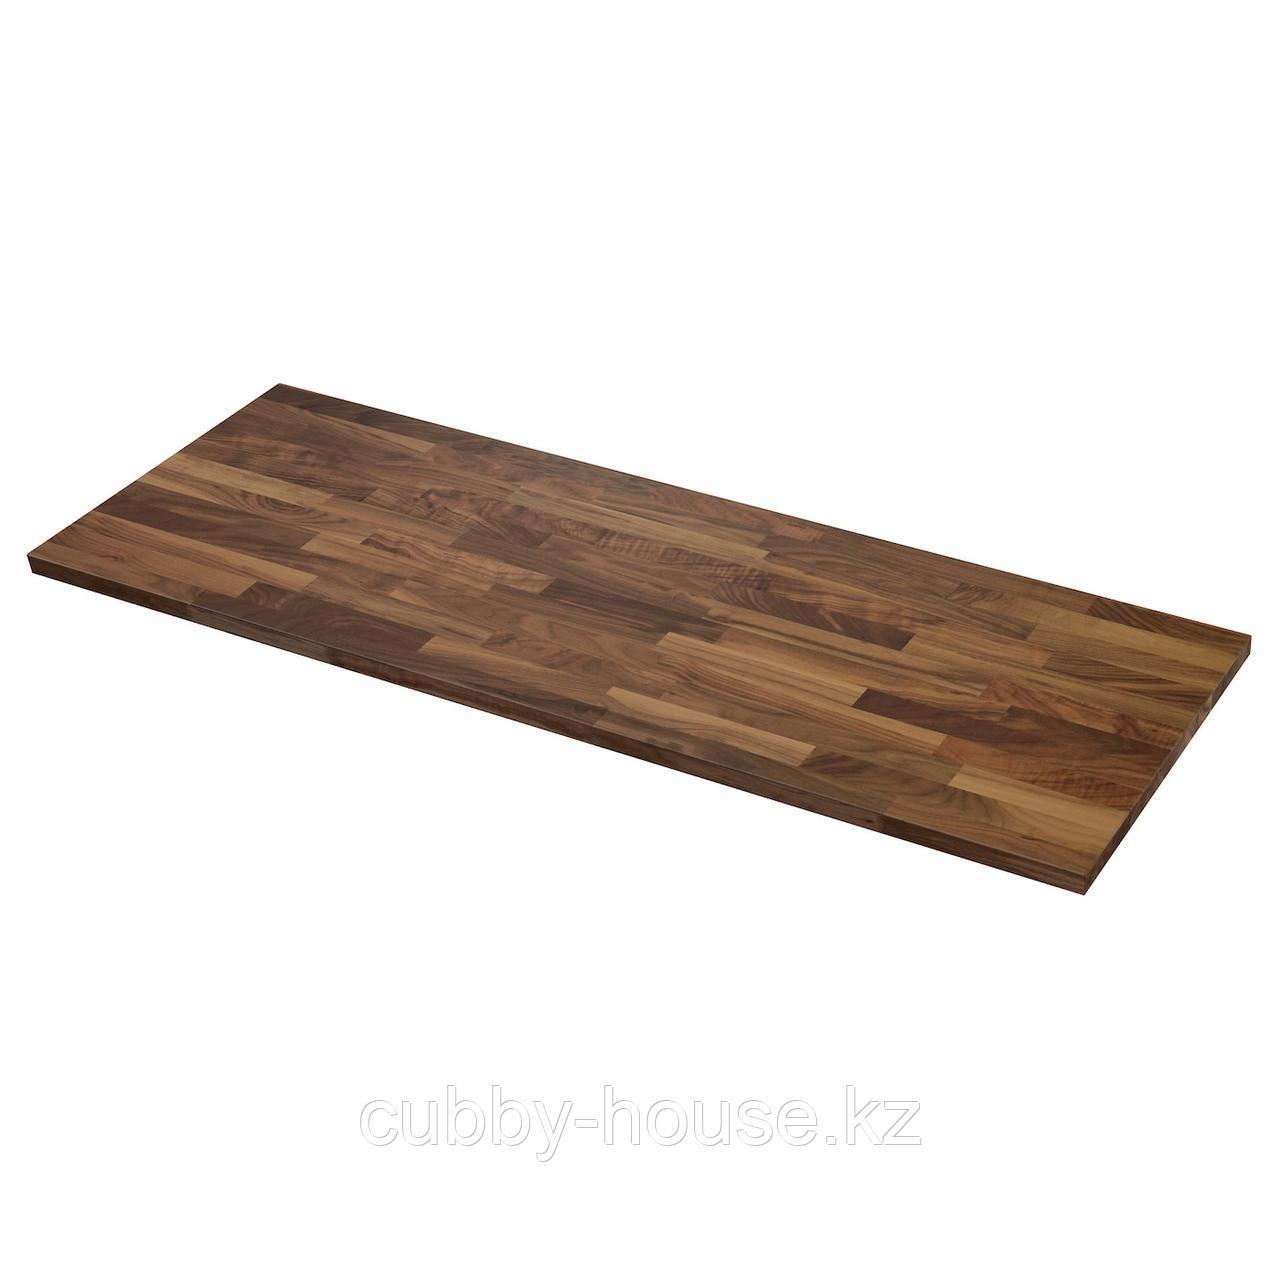 КАРЛБИ Столешница, грецкий орех, шпон, 186x3.8 см